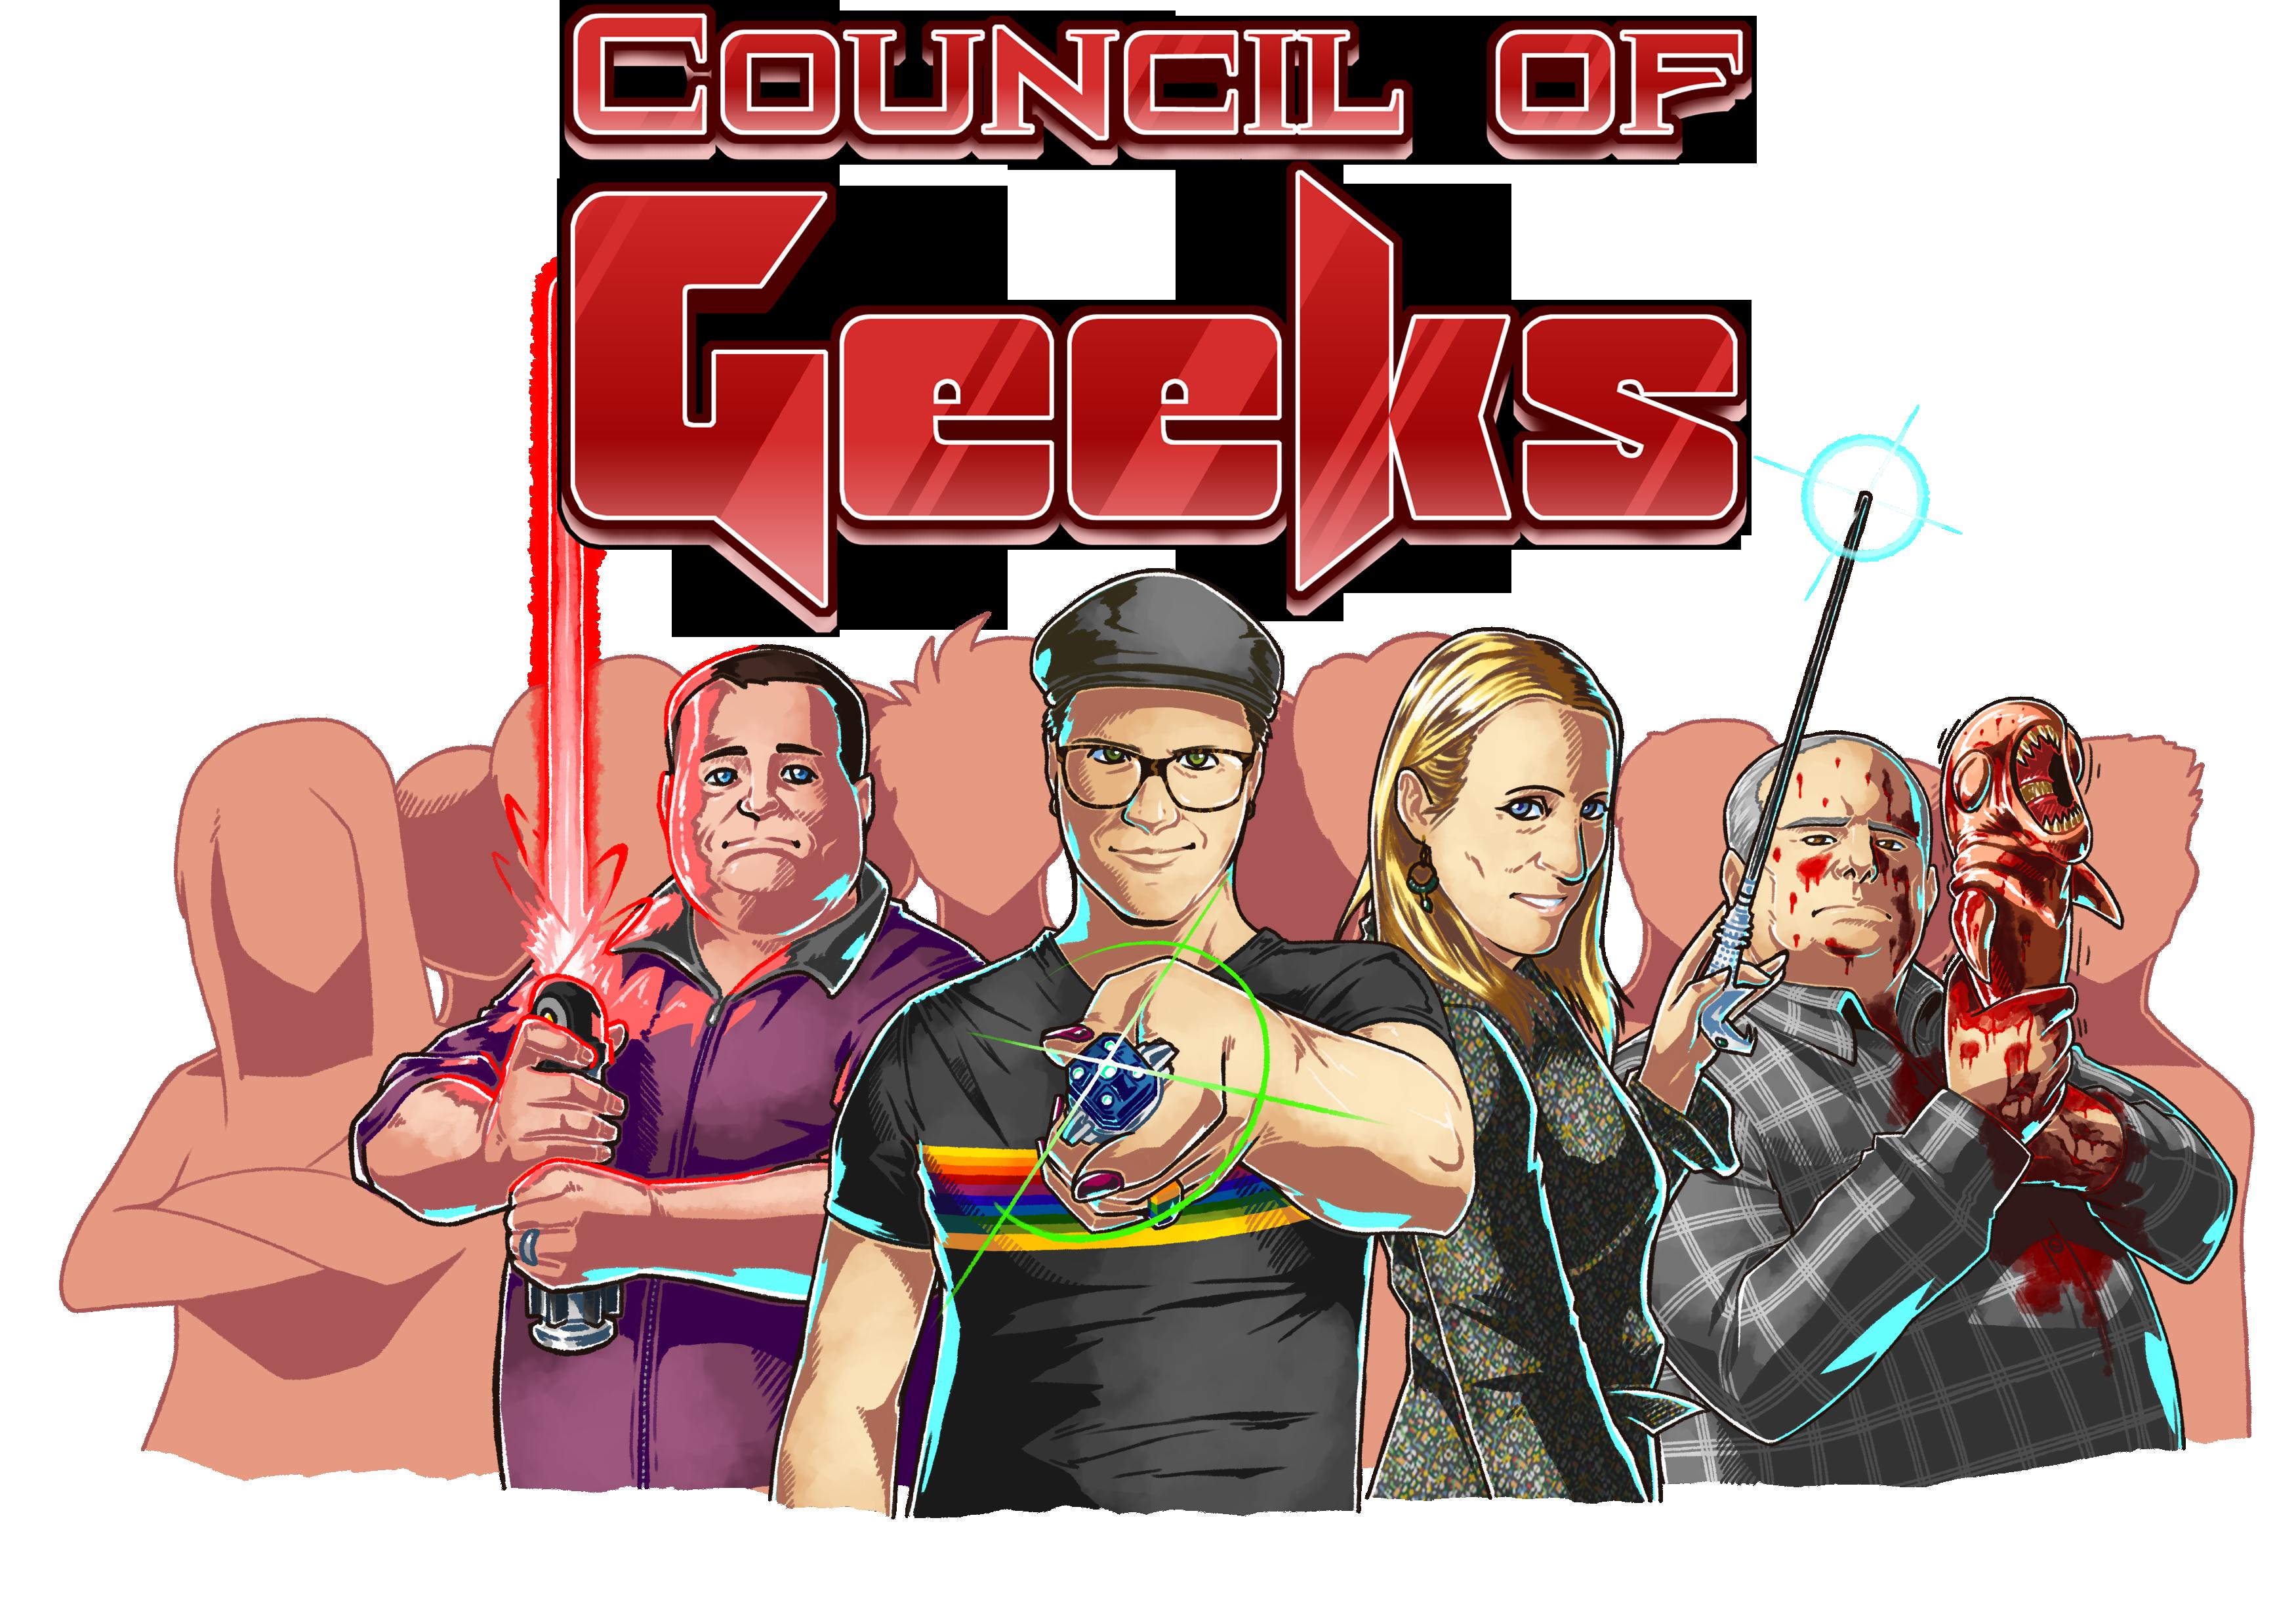 Council of Geeks show art